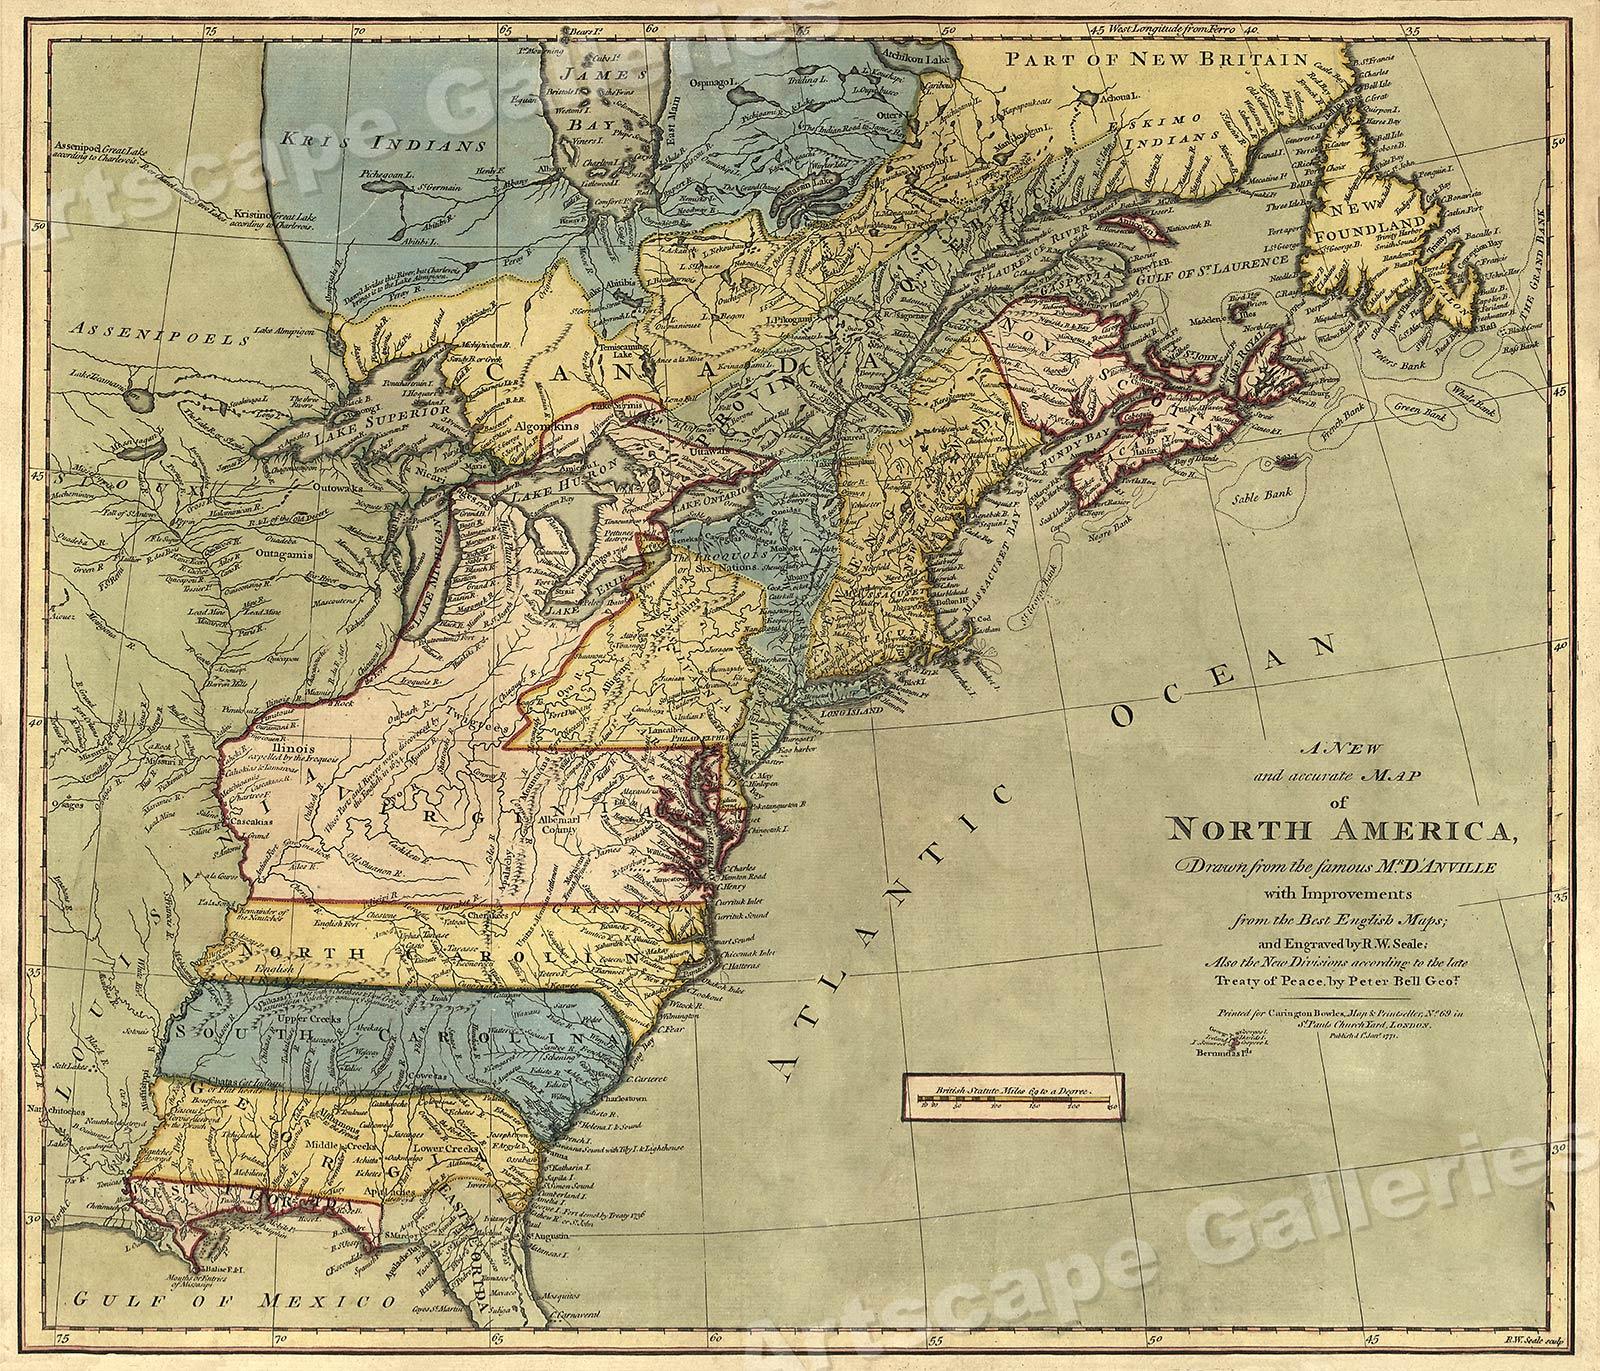 North America 1771 Colonial Map - 13 Colonies - 20x24 | eBay